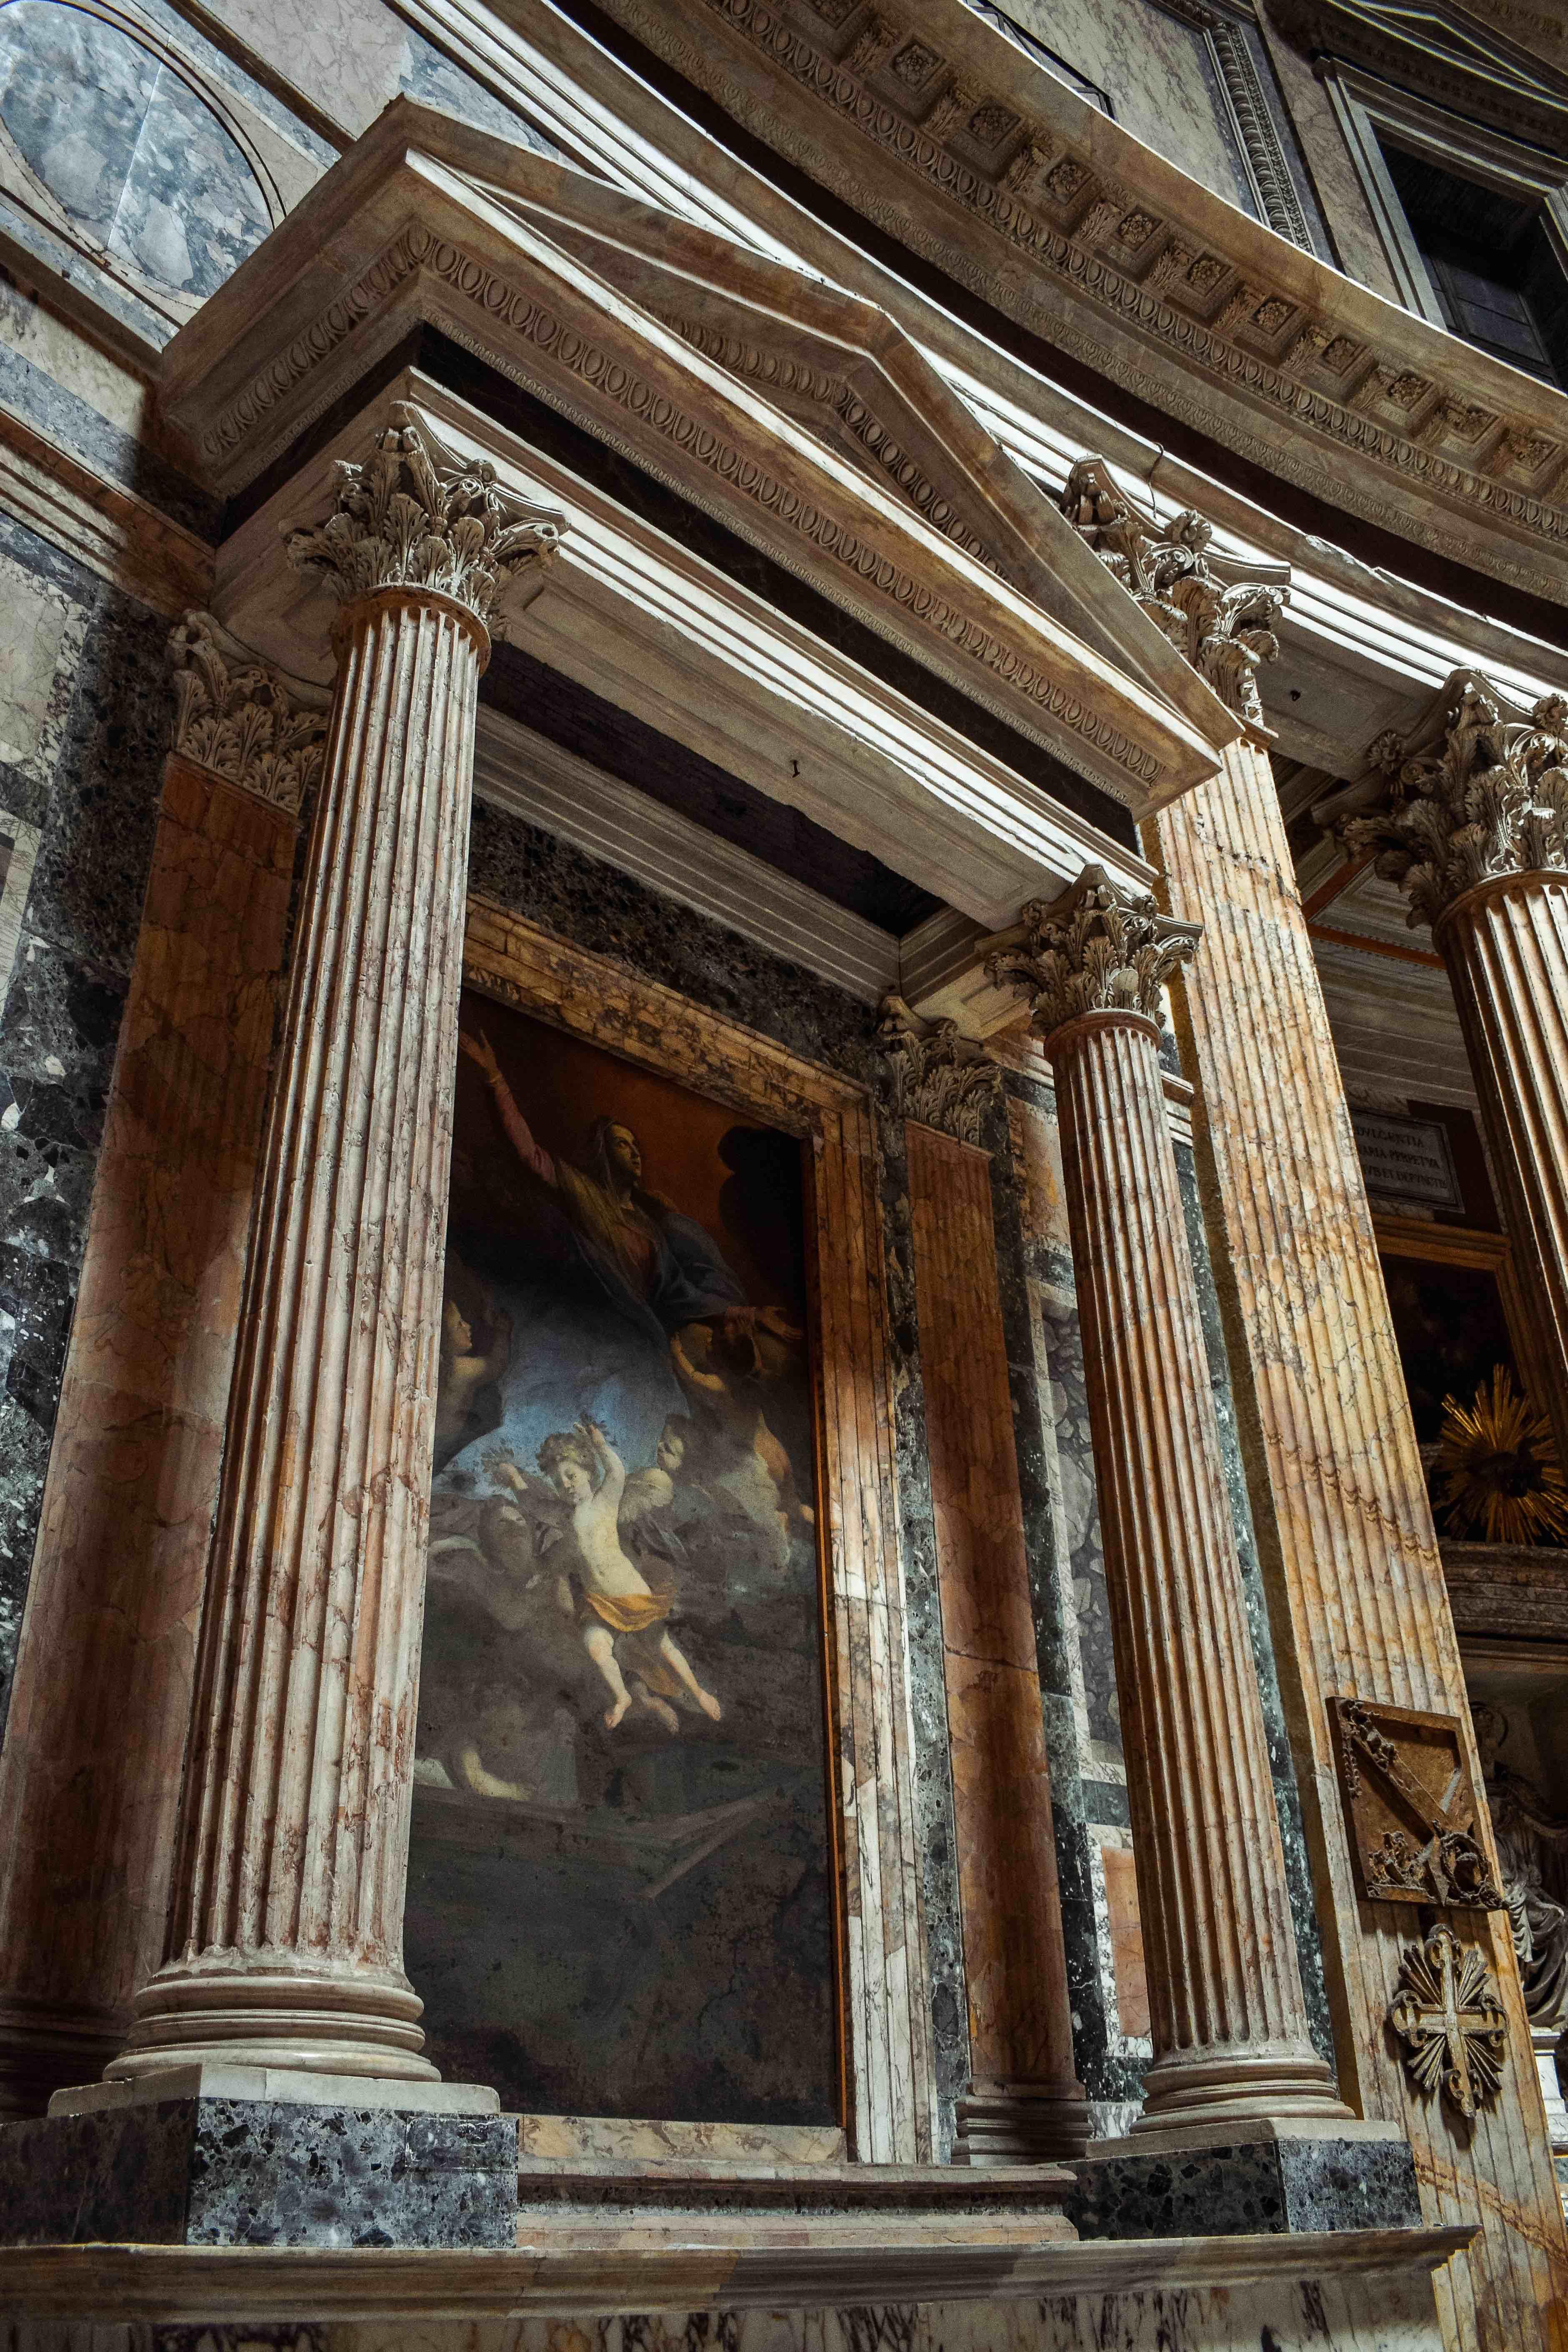 Spending money in Rome. Pantheon.